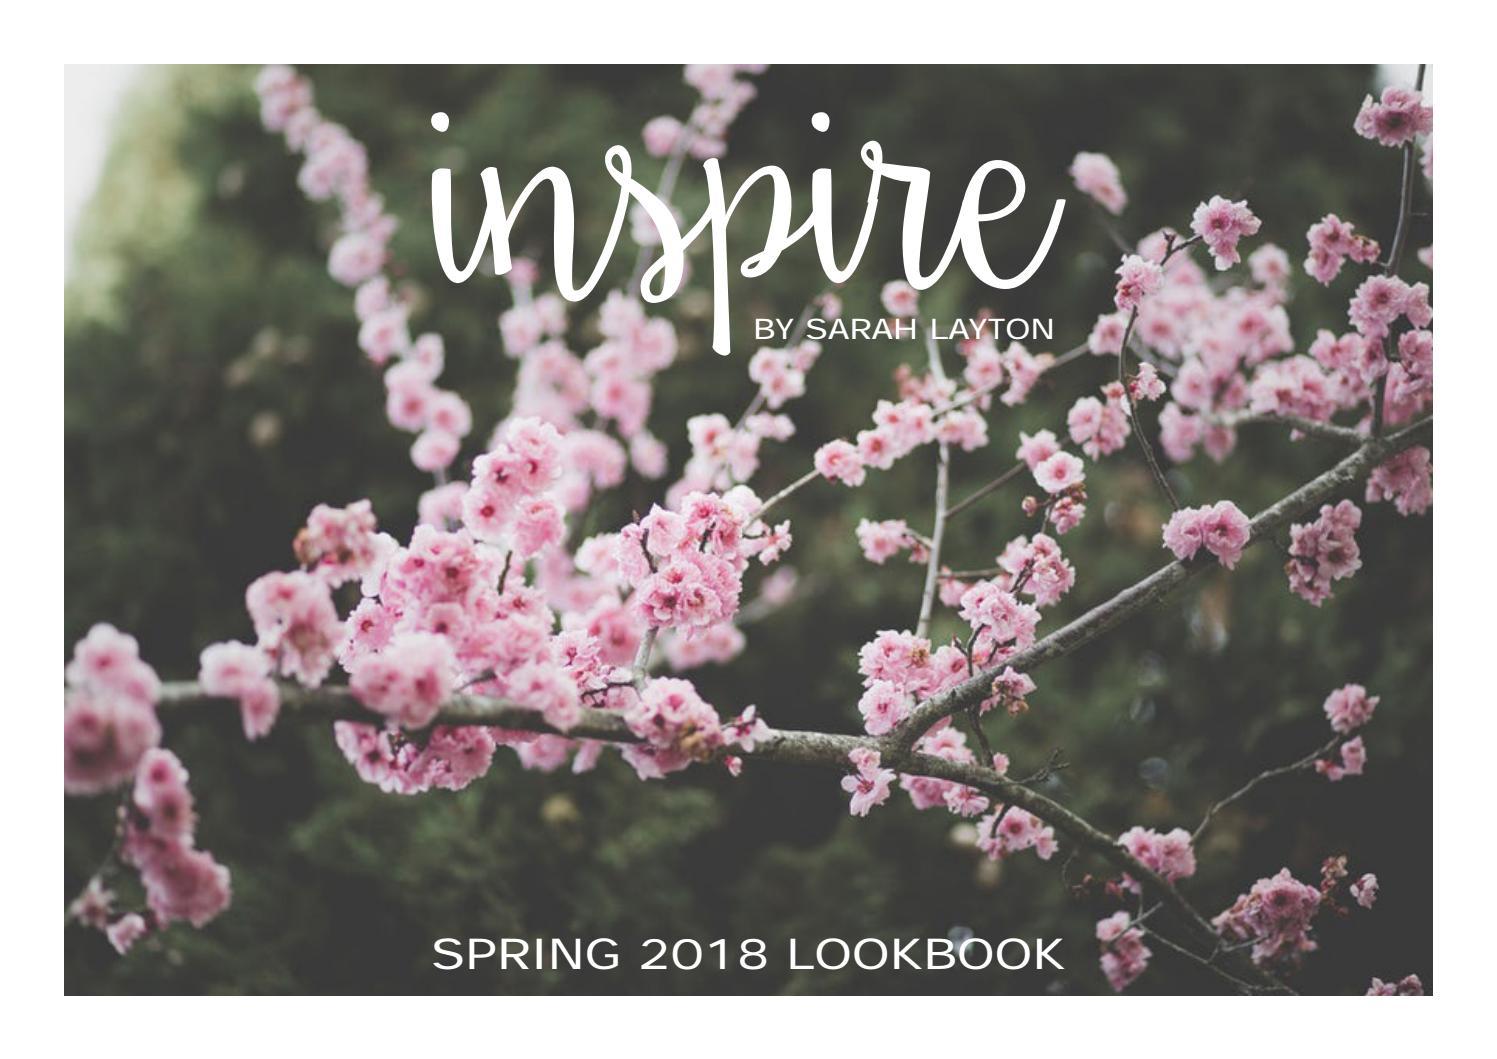 b69e02db9 Sarah Layton Spring 2018 Lookbook by sarahlayton - issuu